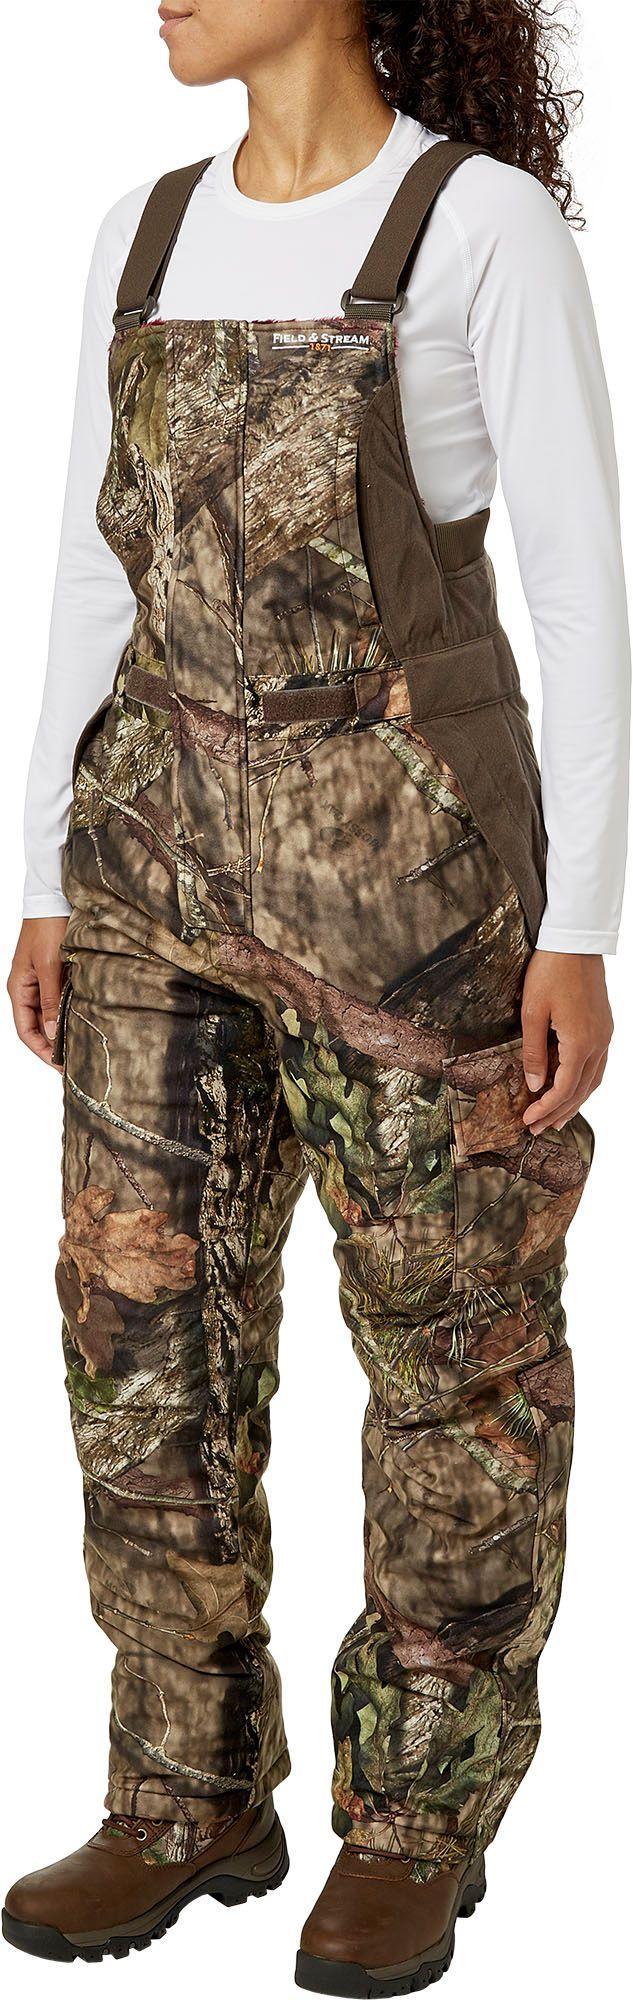 Field & Stream Women's Command Hunt SmartHeat Hunting Bibs, Size: Large, Mossy Oak Country thumbnail